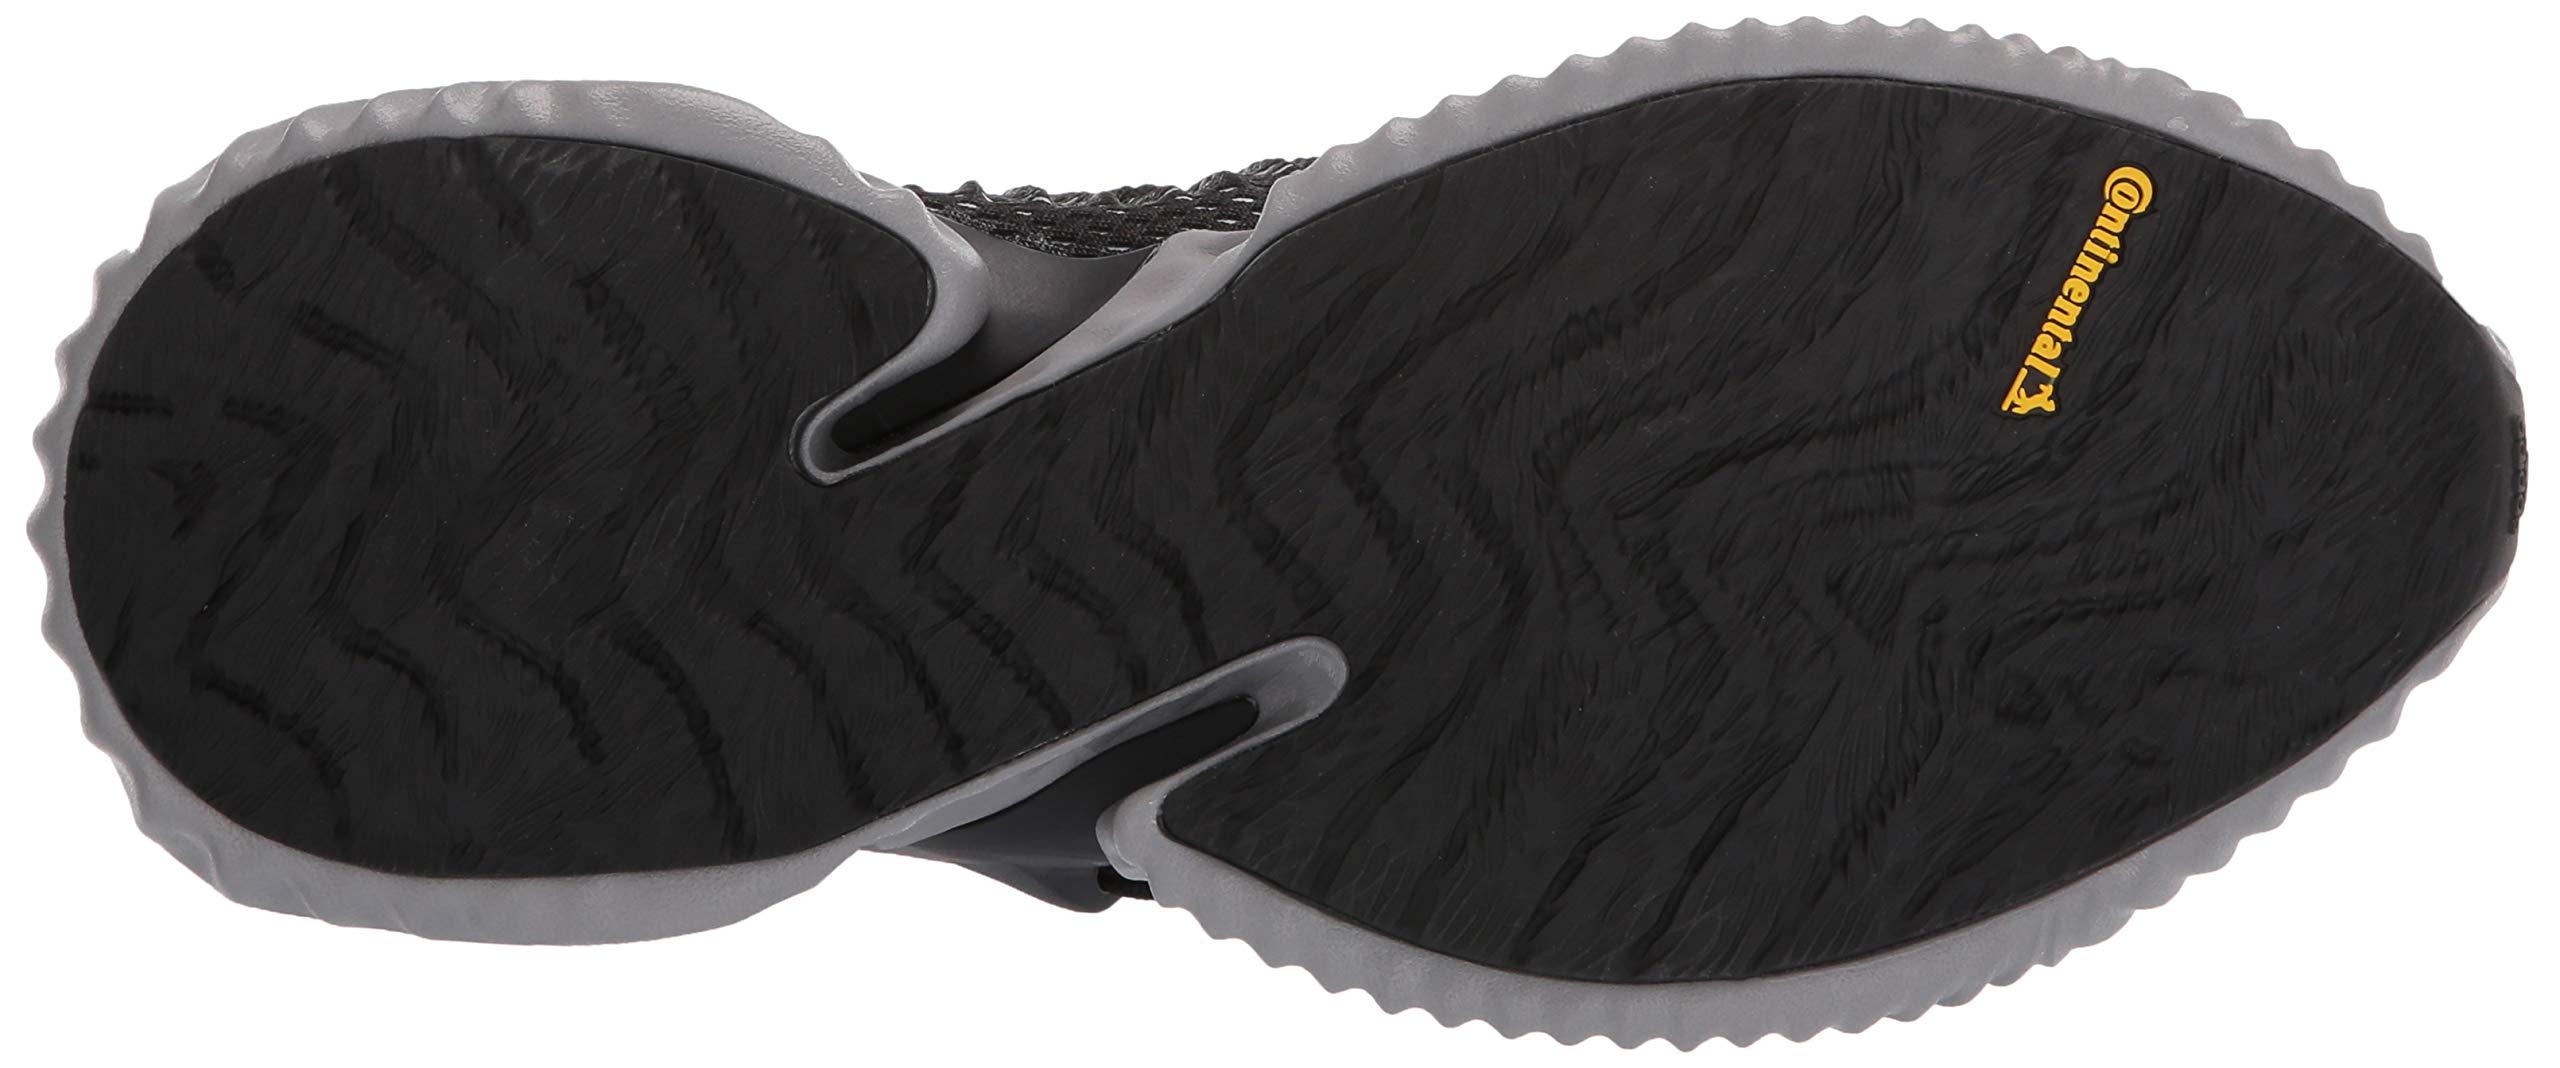 Adidas Kids Alphabounce Instinct, Black/White/Grey, 1 M US Little Kid by adidas (Image #3)